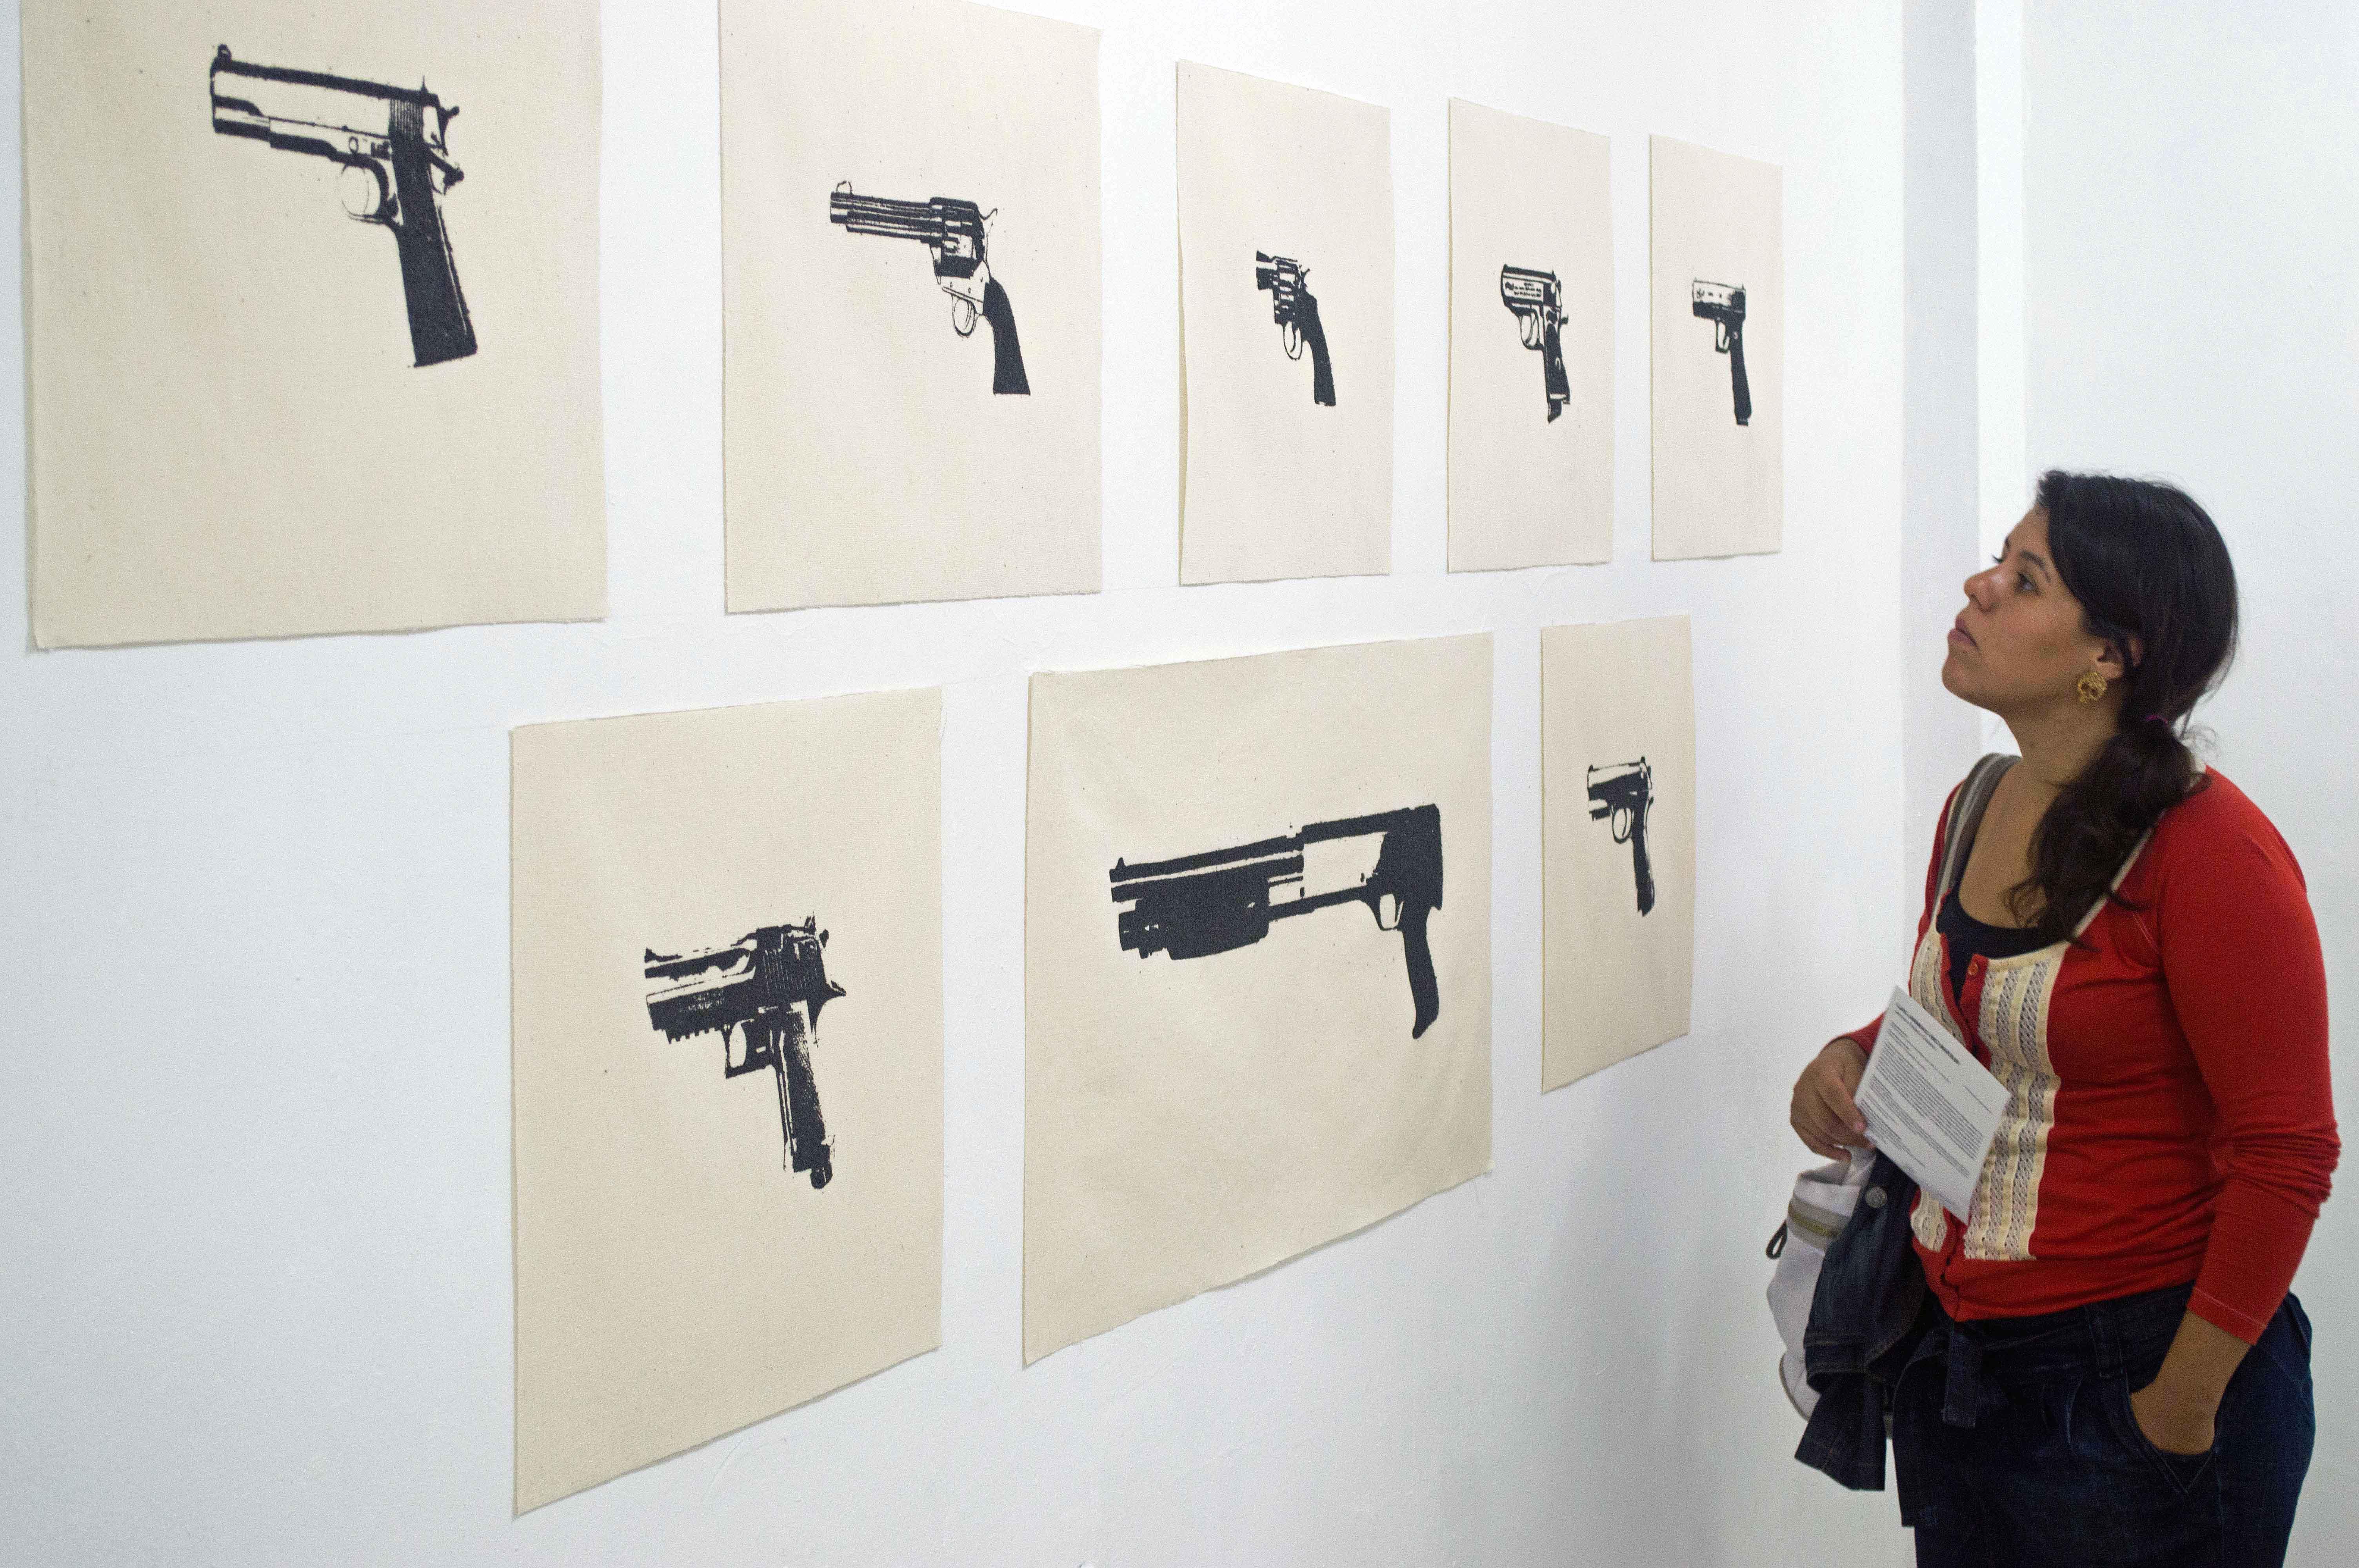 Guns do not kill